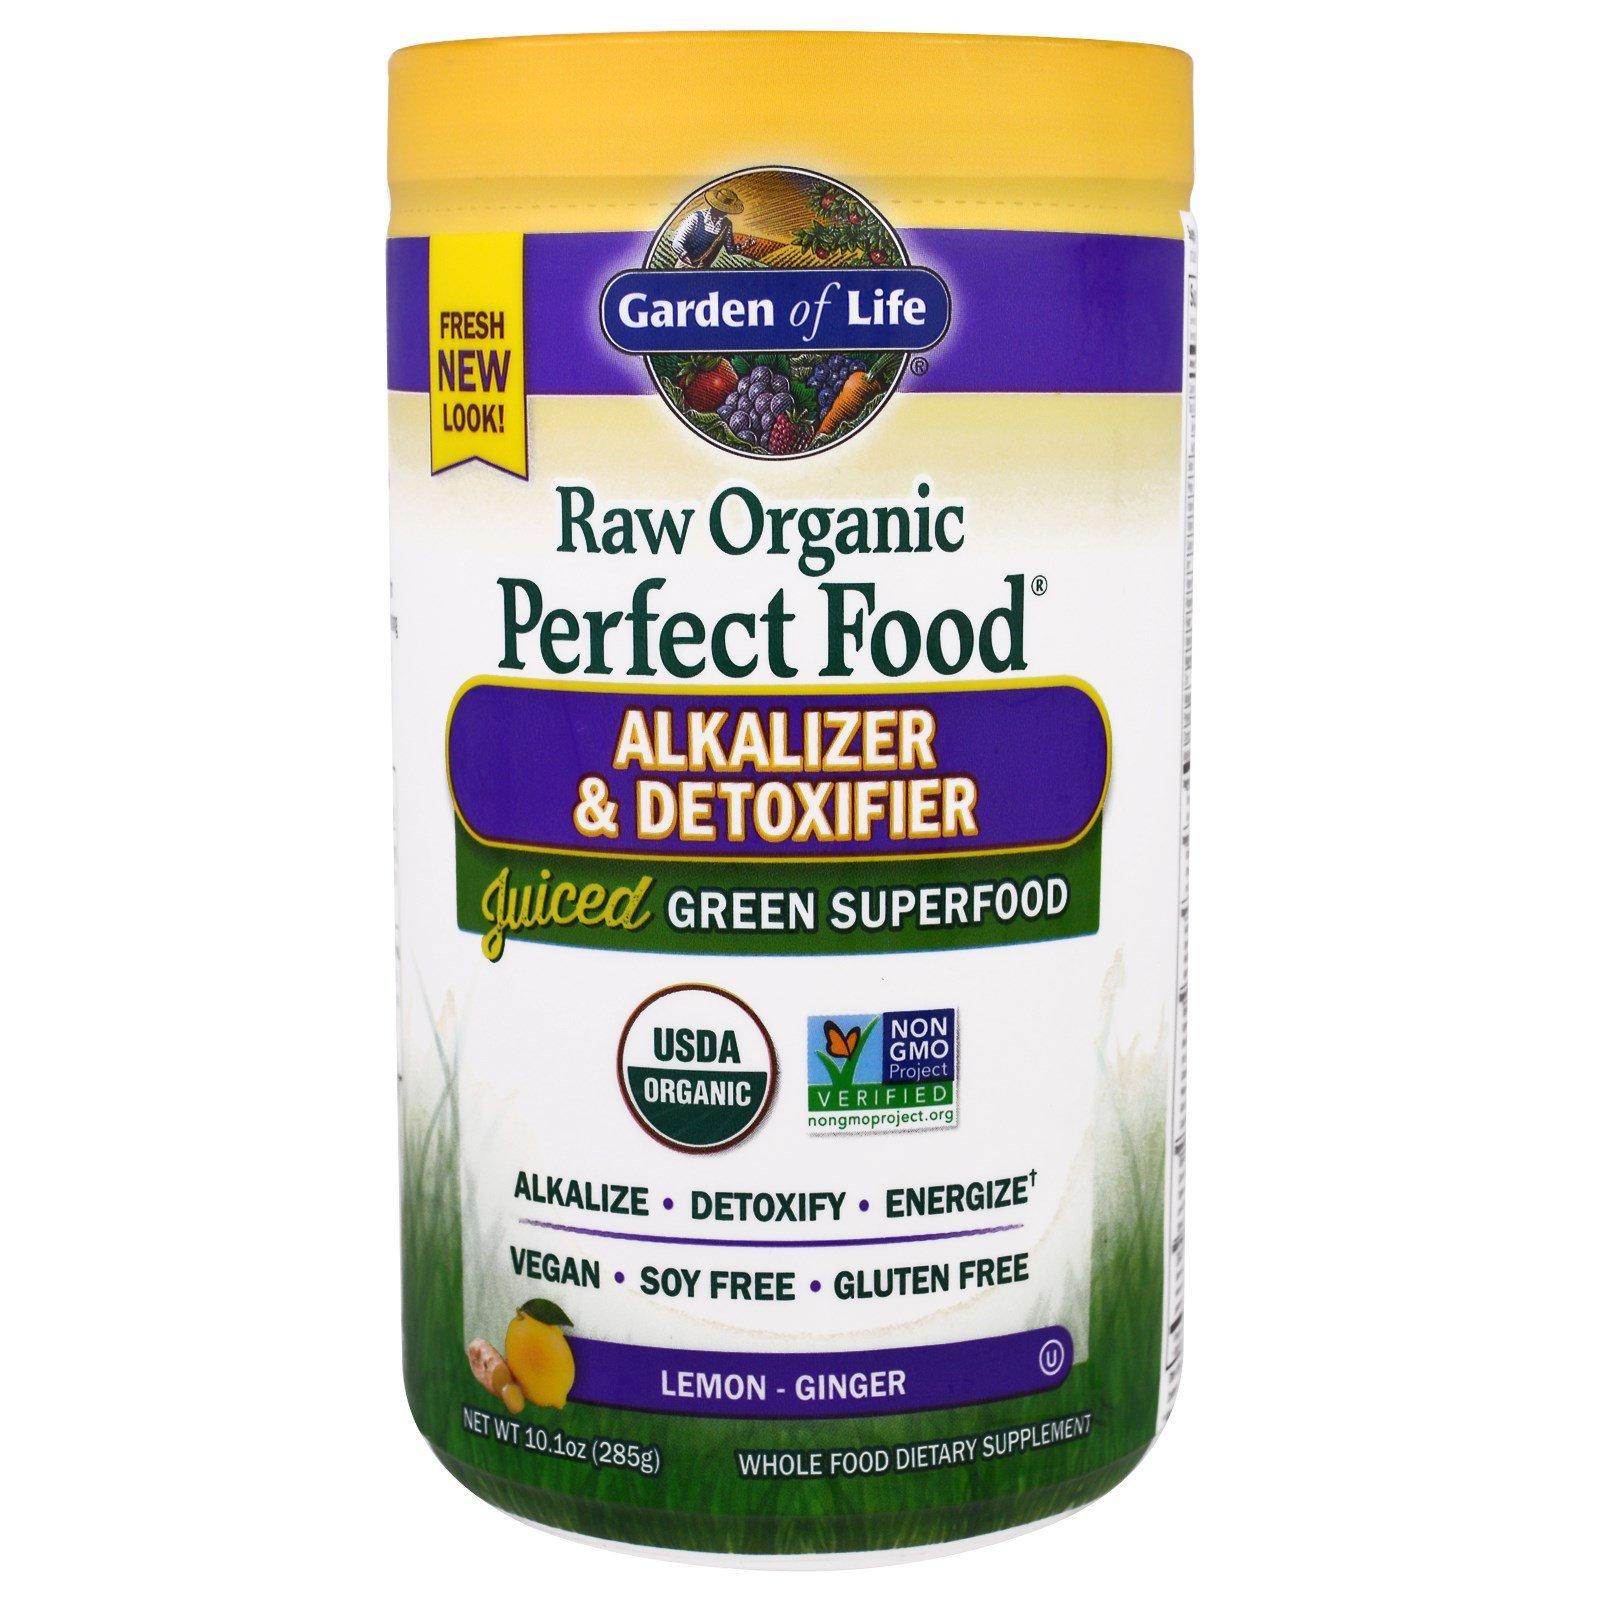 Garden of Life, Raw Organic Perfect Food, Alkalizer & Detoxifier, Lemon-Ginger, 10.1 oz (285 g)